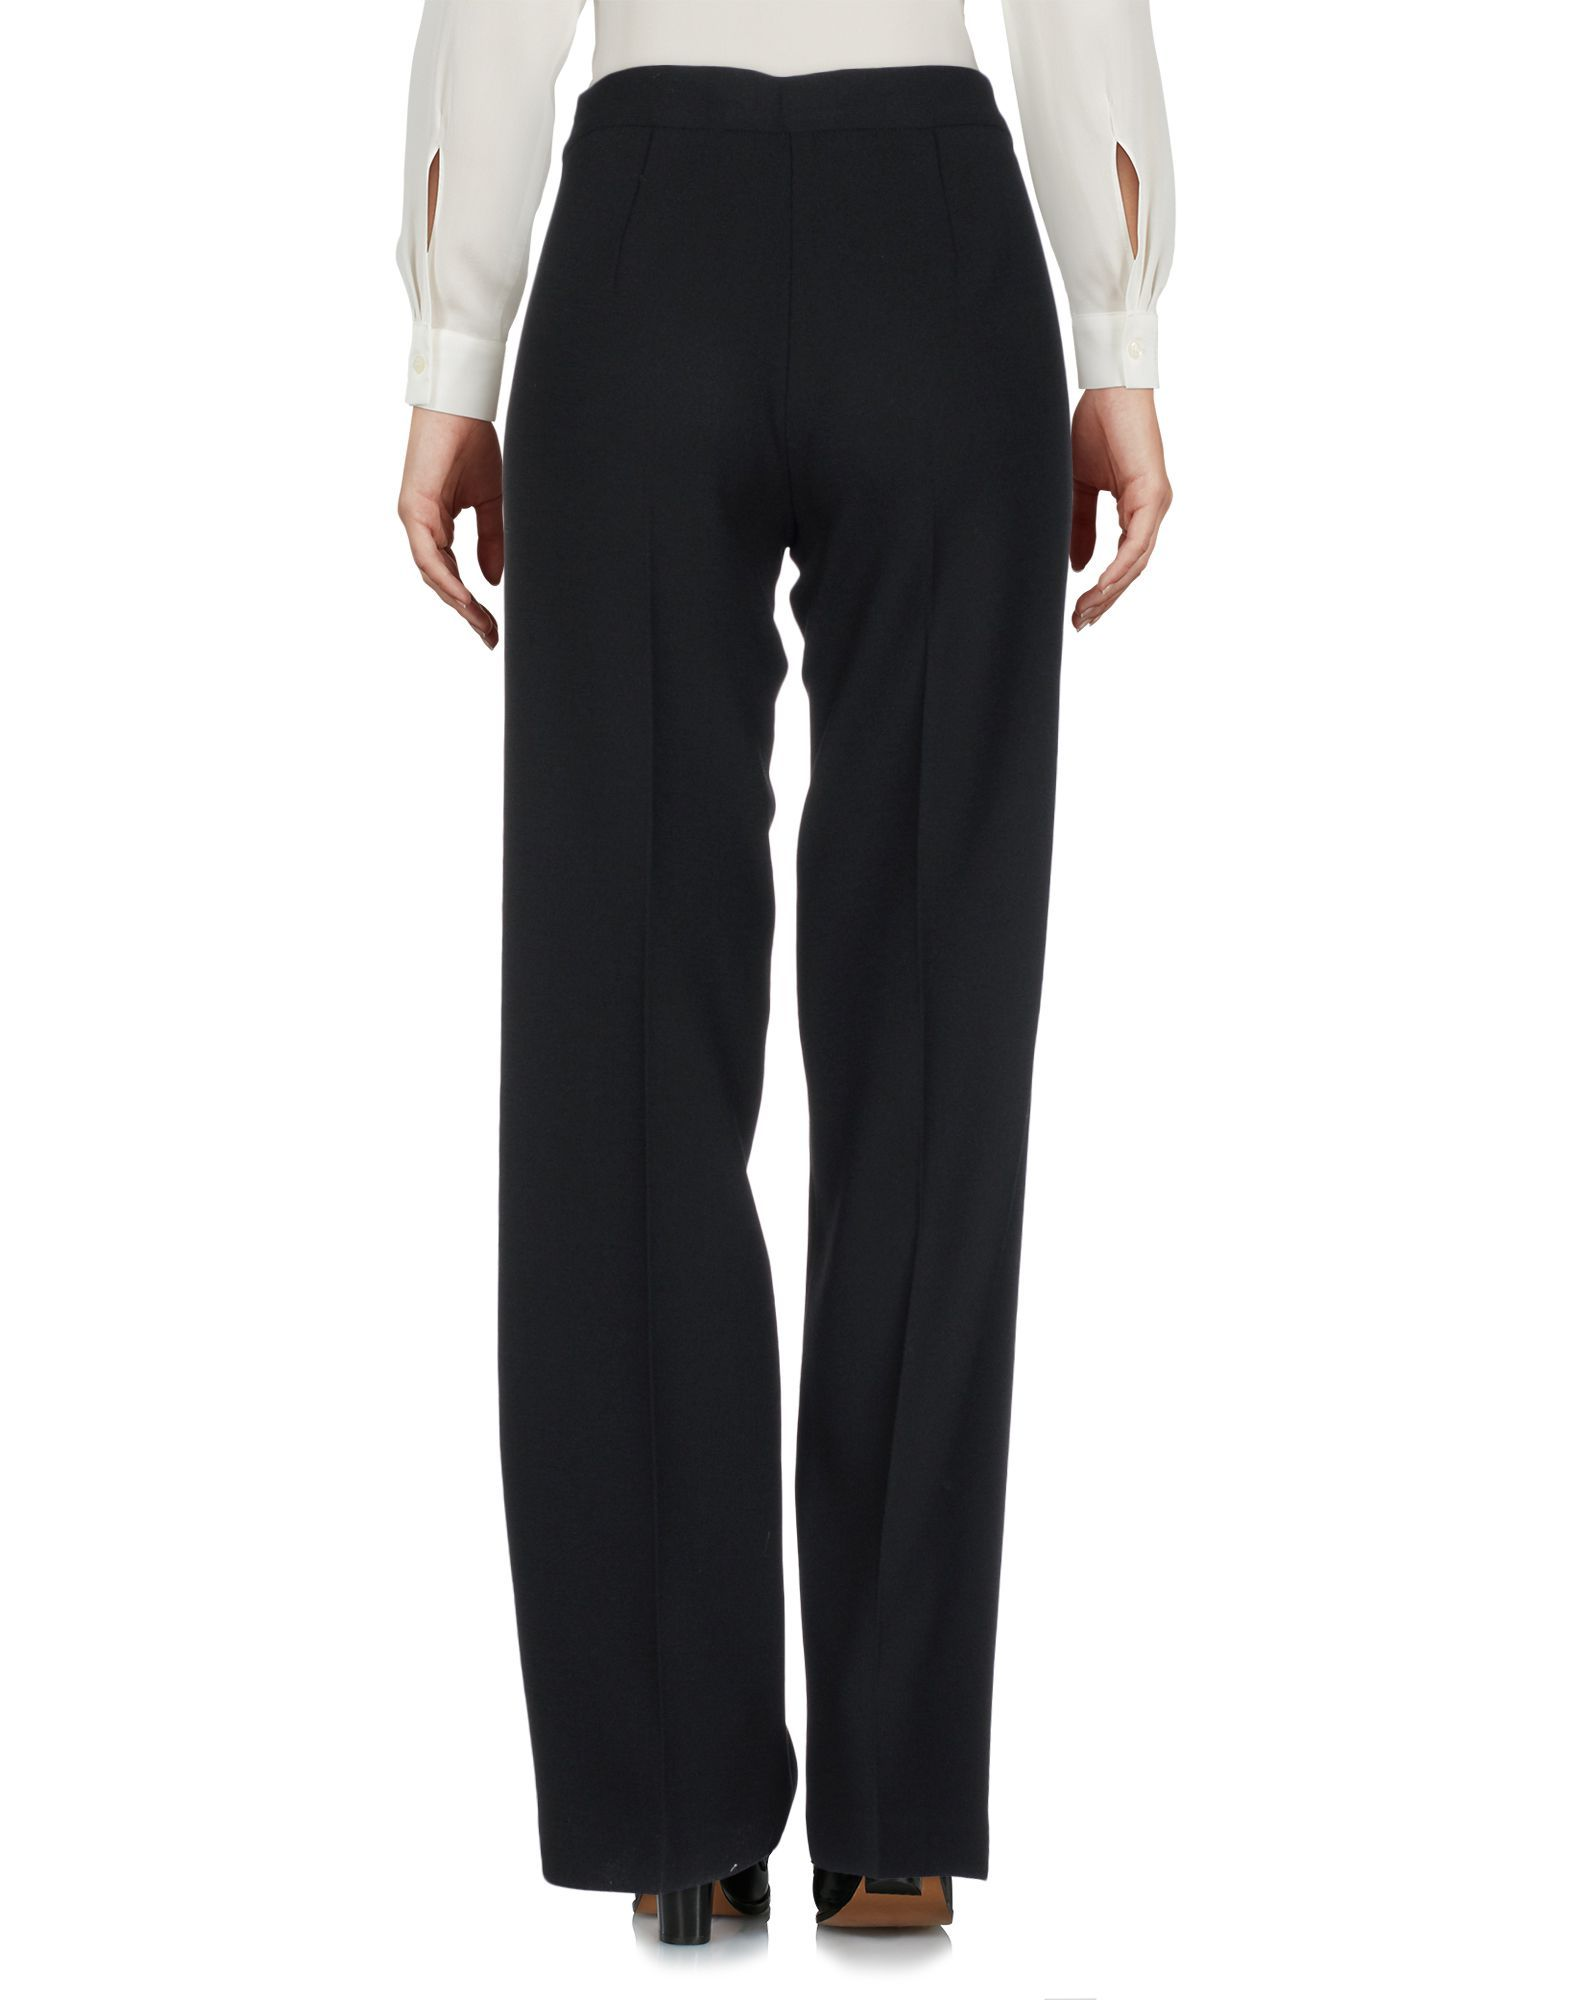 P.A.R.O.S.H. Black Wool Trousers